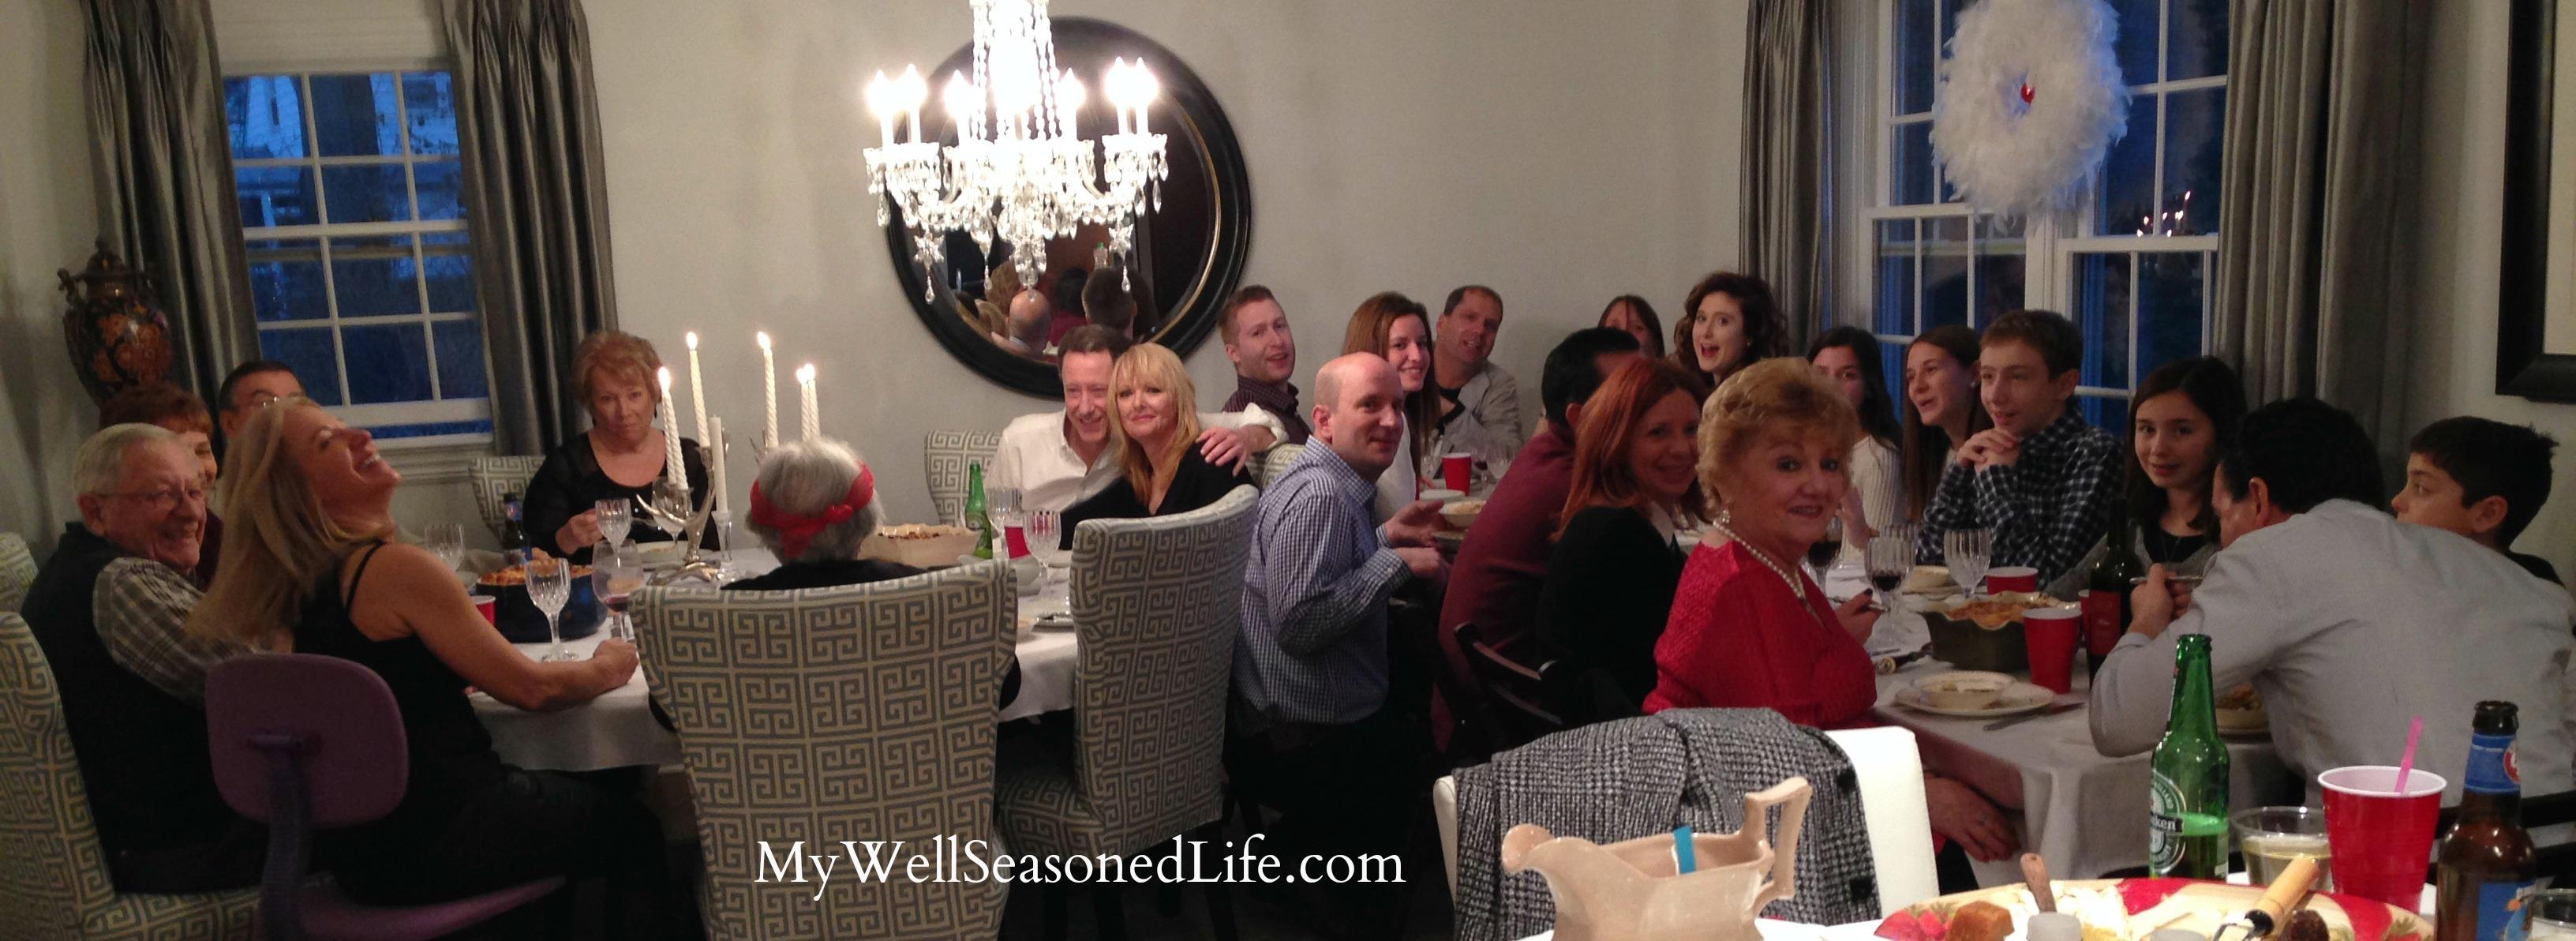 Lyness/Scudieri Christmas gathering